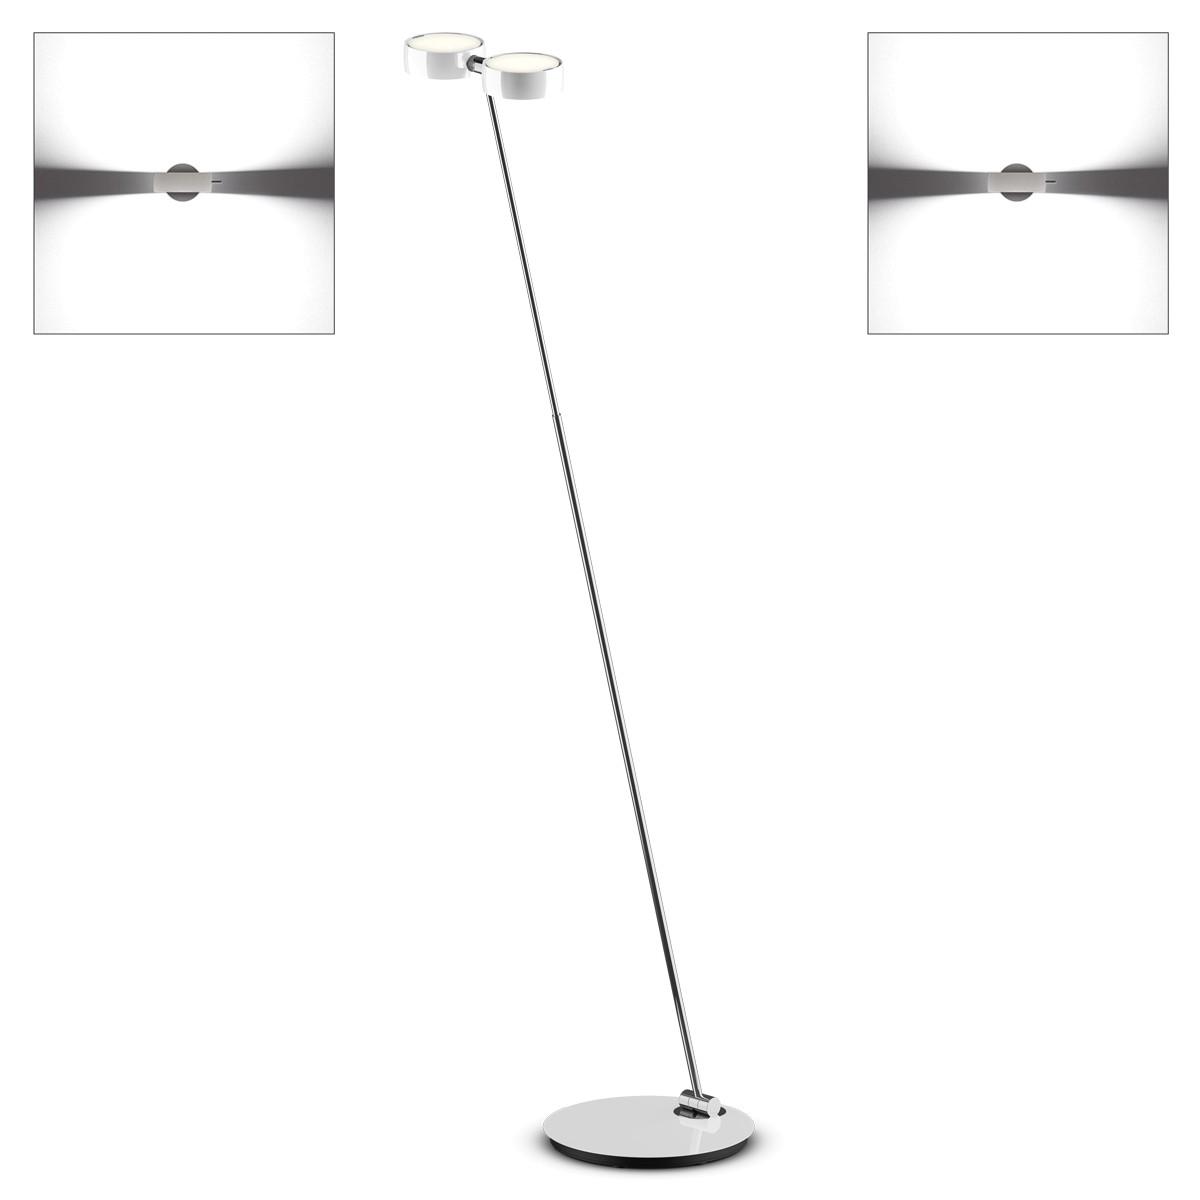 Occhio Sento A LED terra Stehleuchte, 2700 K, Chrom / weiß glänzend